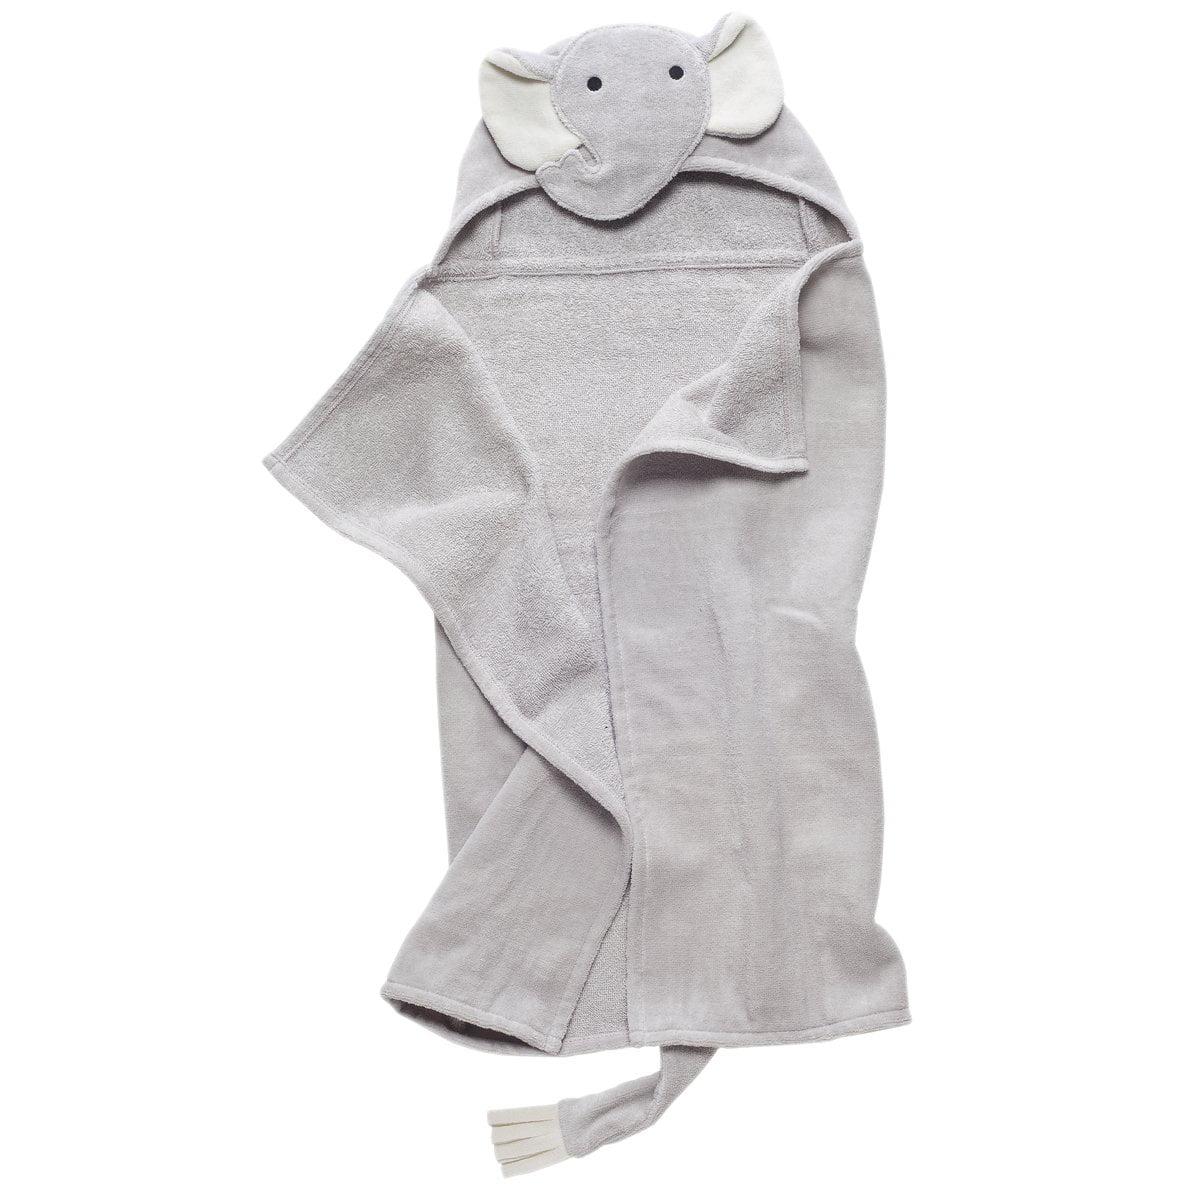 Elegant Baby Bath Time Gift Hooded Towel Wrap Gray Elephant